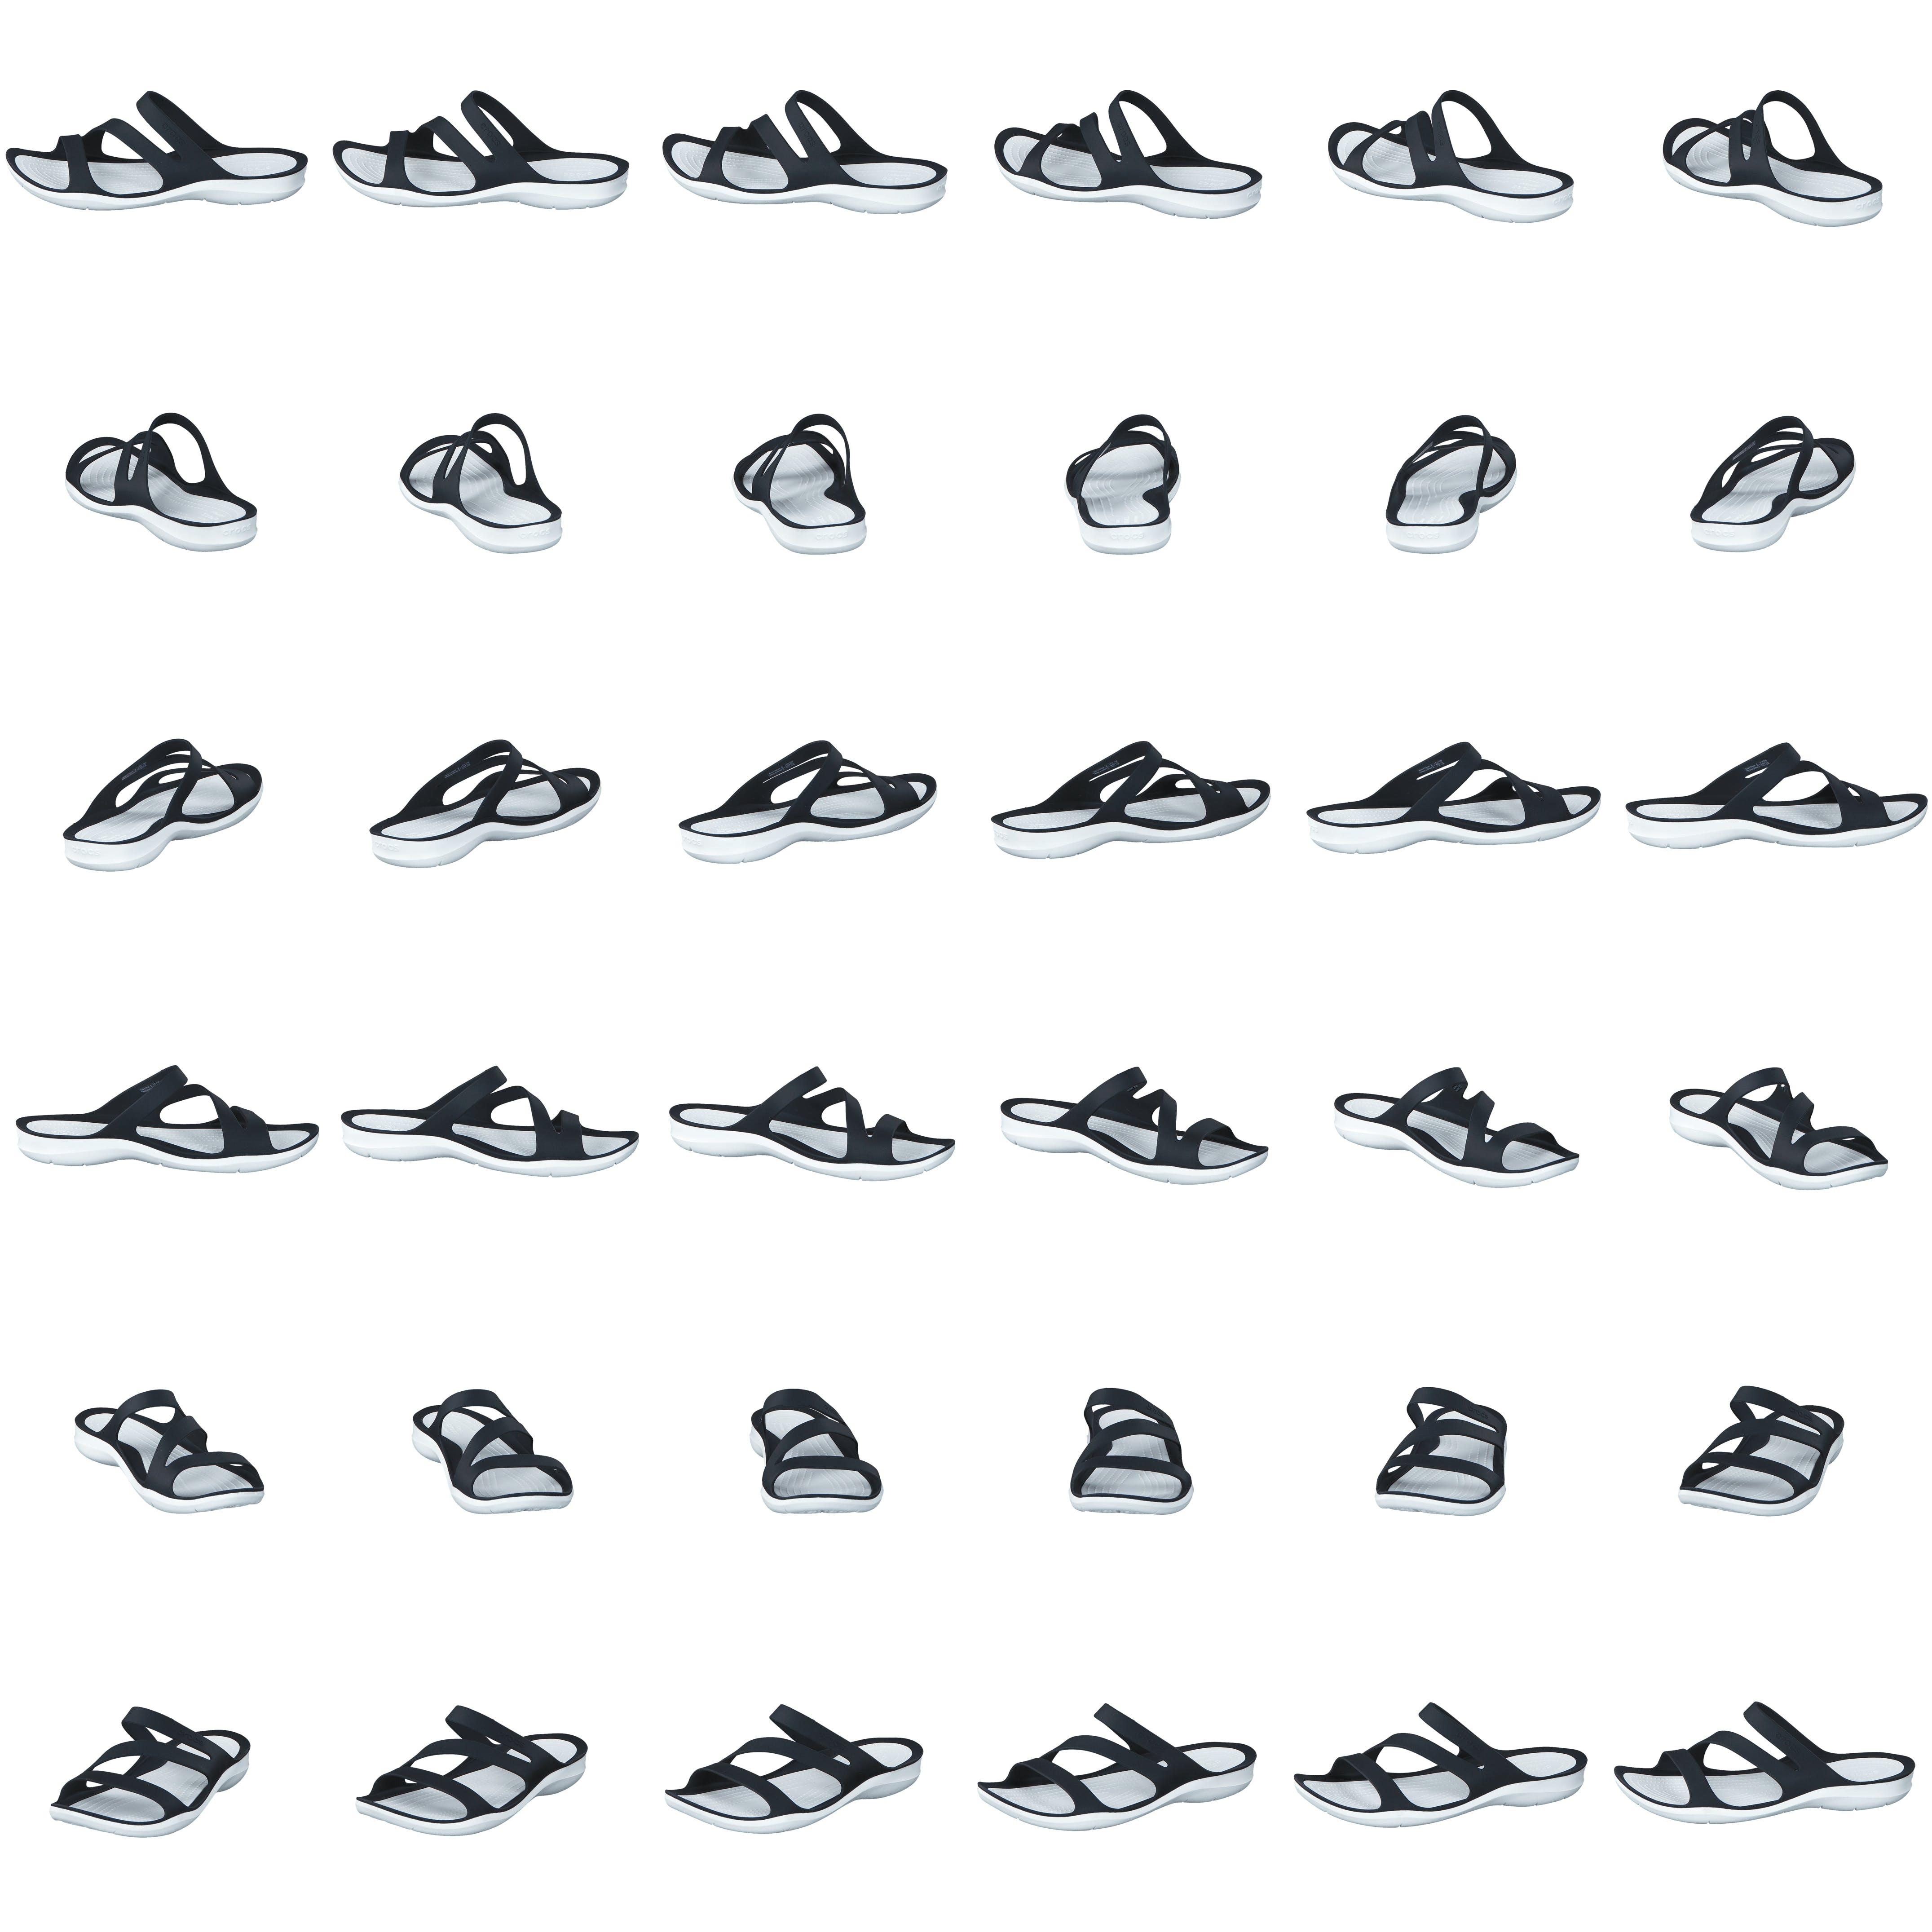 Køb Crocs Swiftwater Sandal W BlackWhite Sko Online